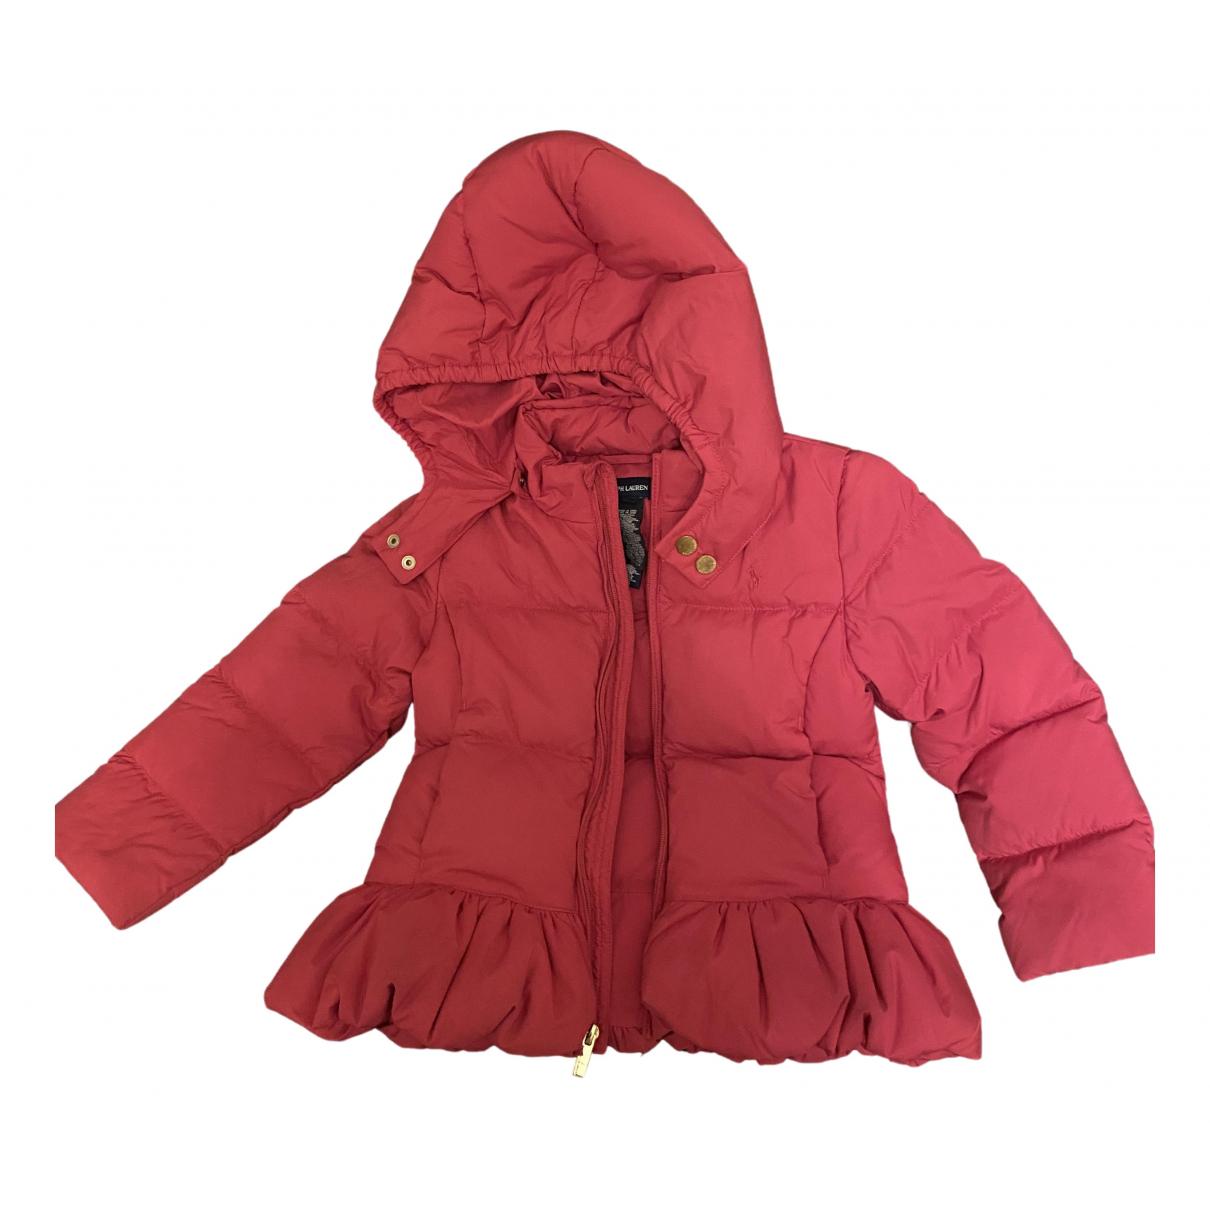 Ralph Lauren N Pink jacket & coat for Kids 6 years - up to 114cm FR